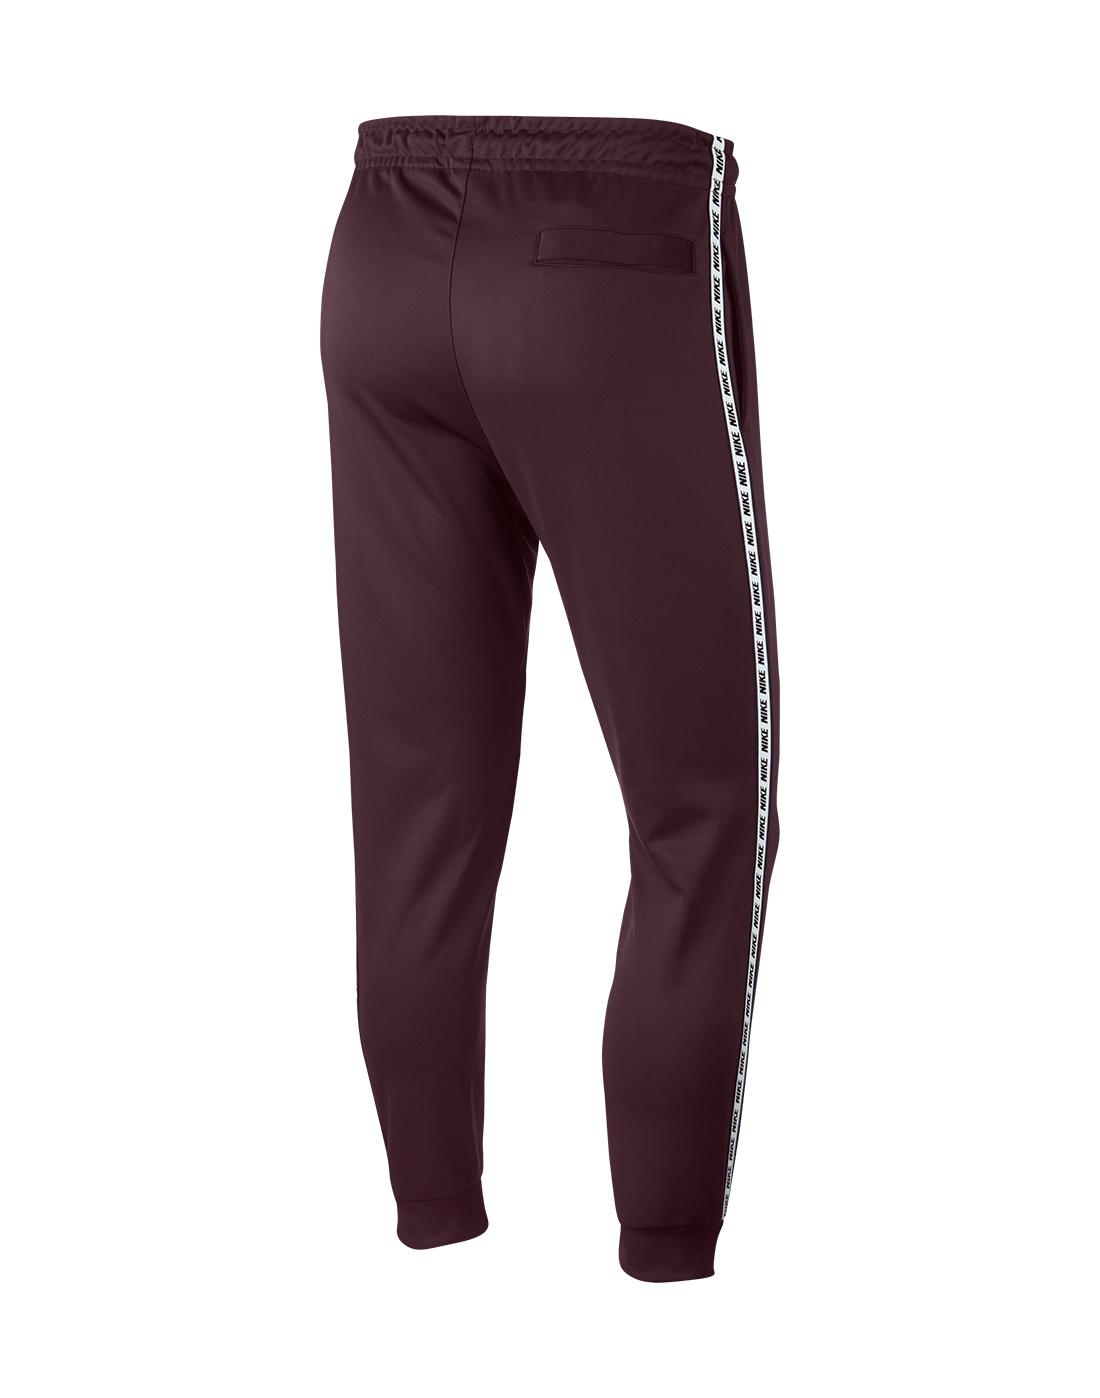 265d740c5 Men's Burgundy Nike Taped Track Pants   Life Style Sports